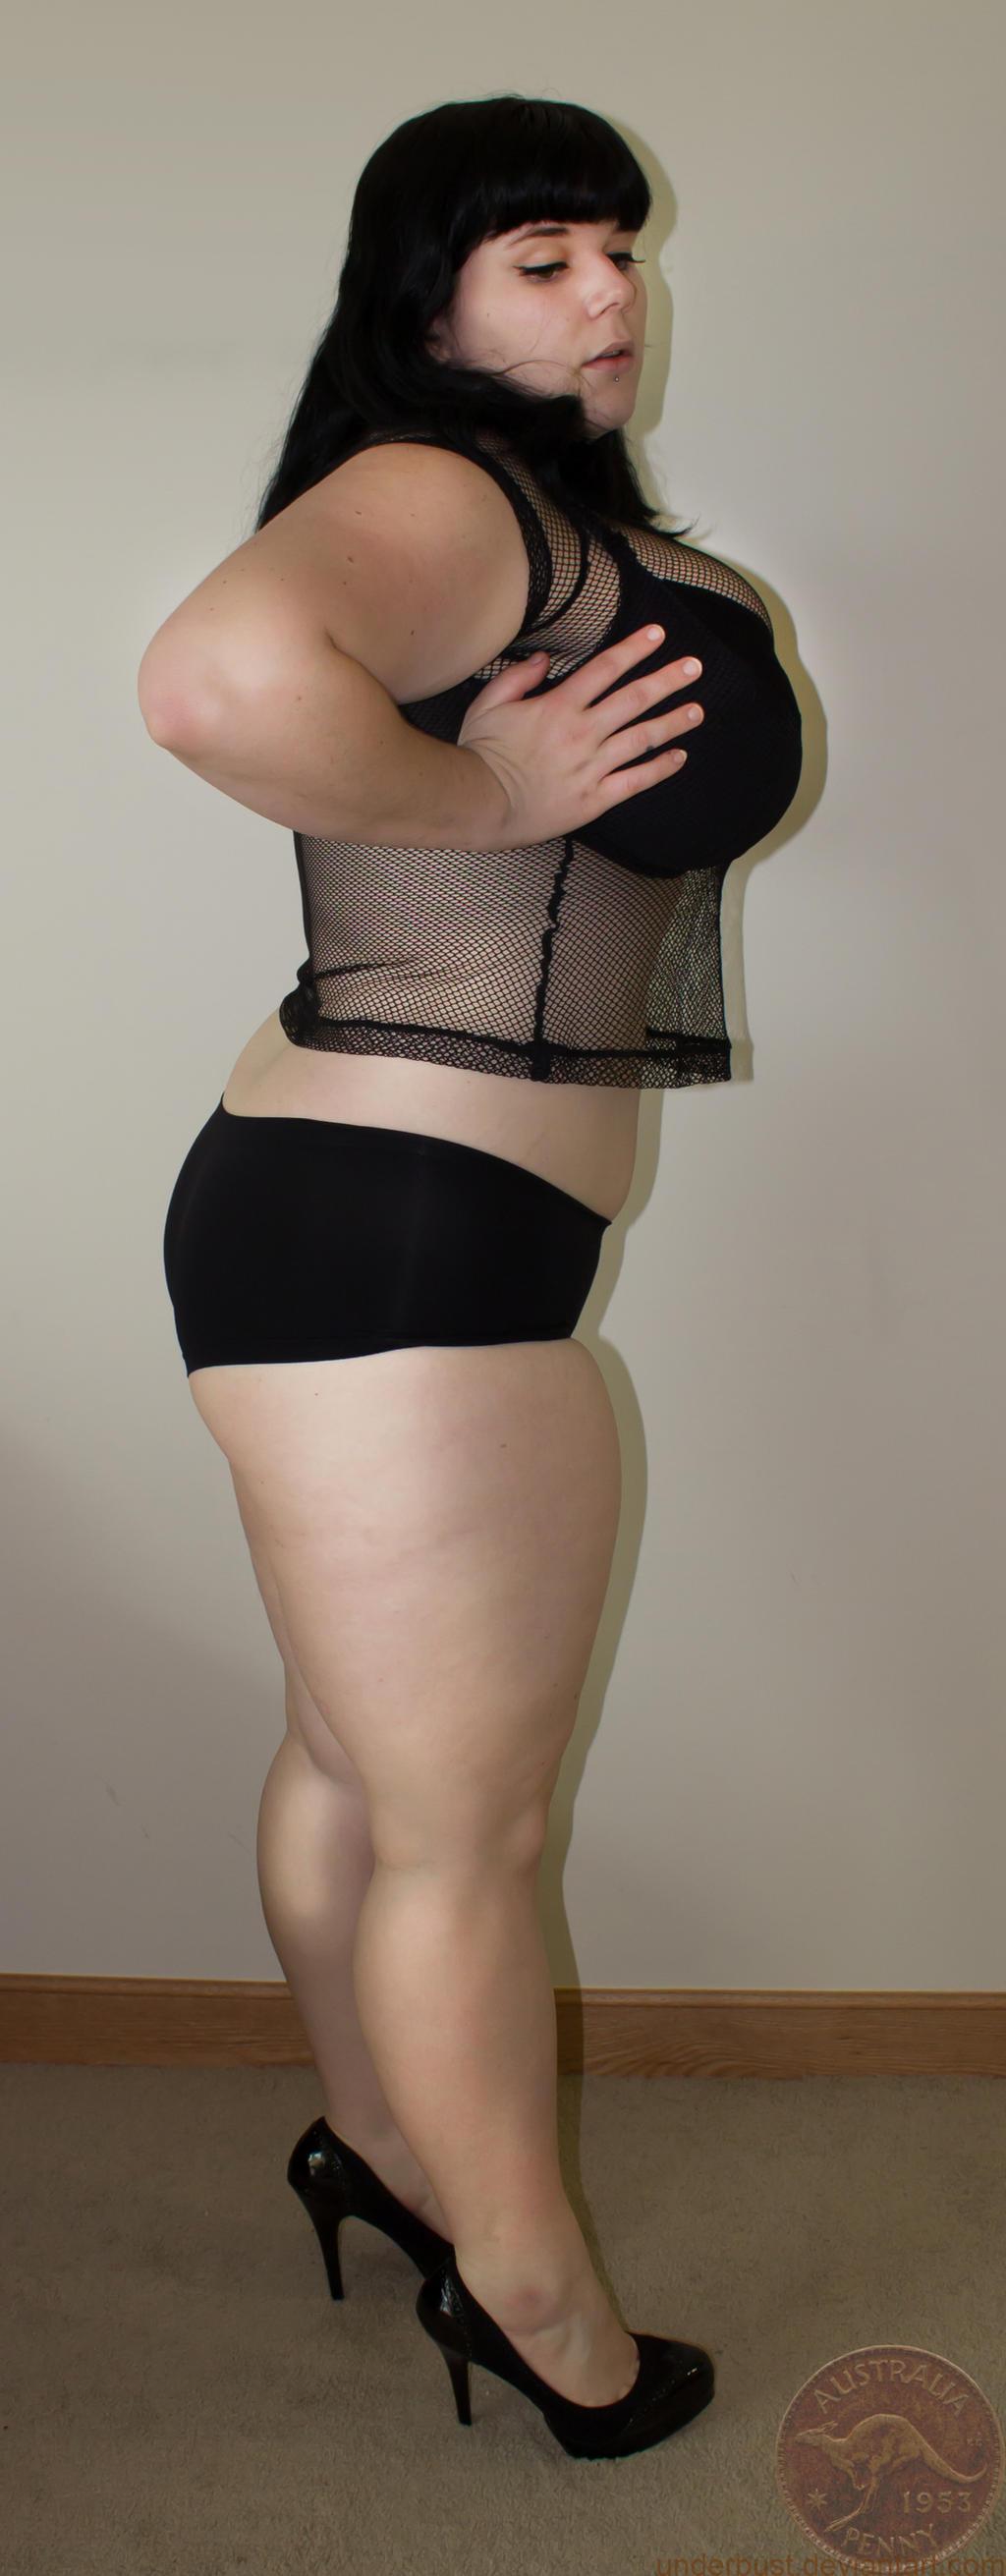 thighs by underbust on DeviantArt